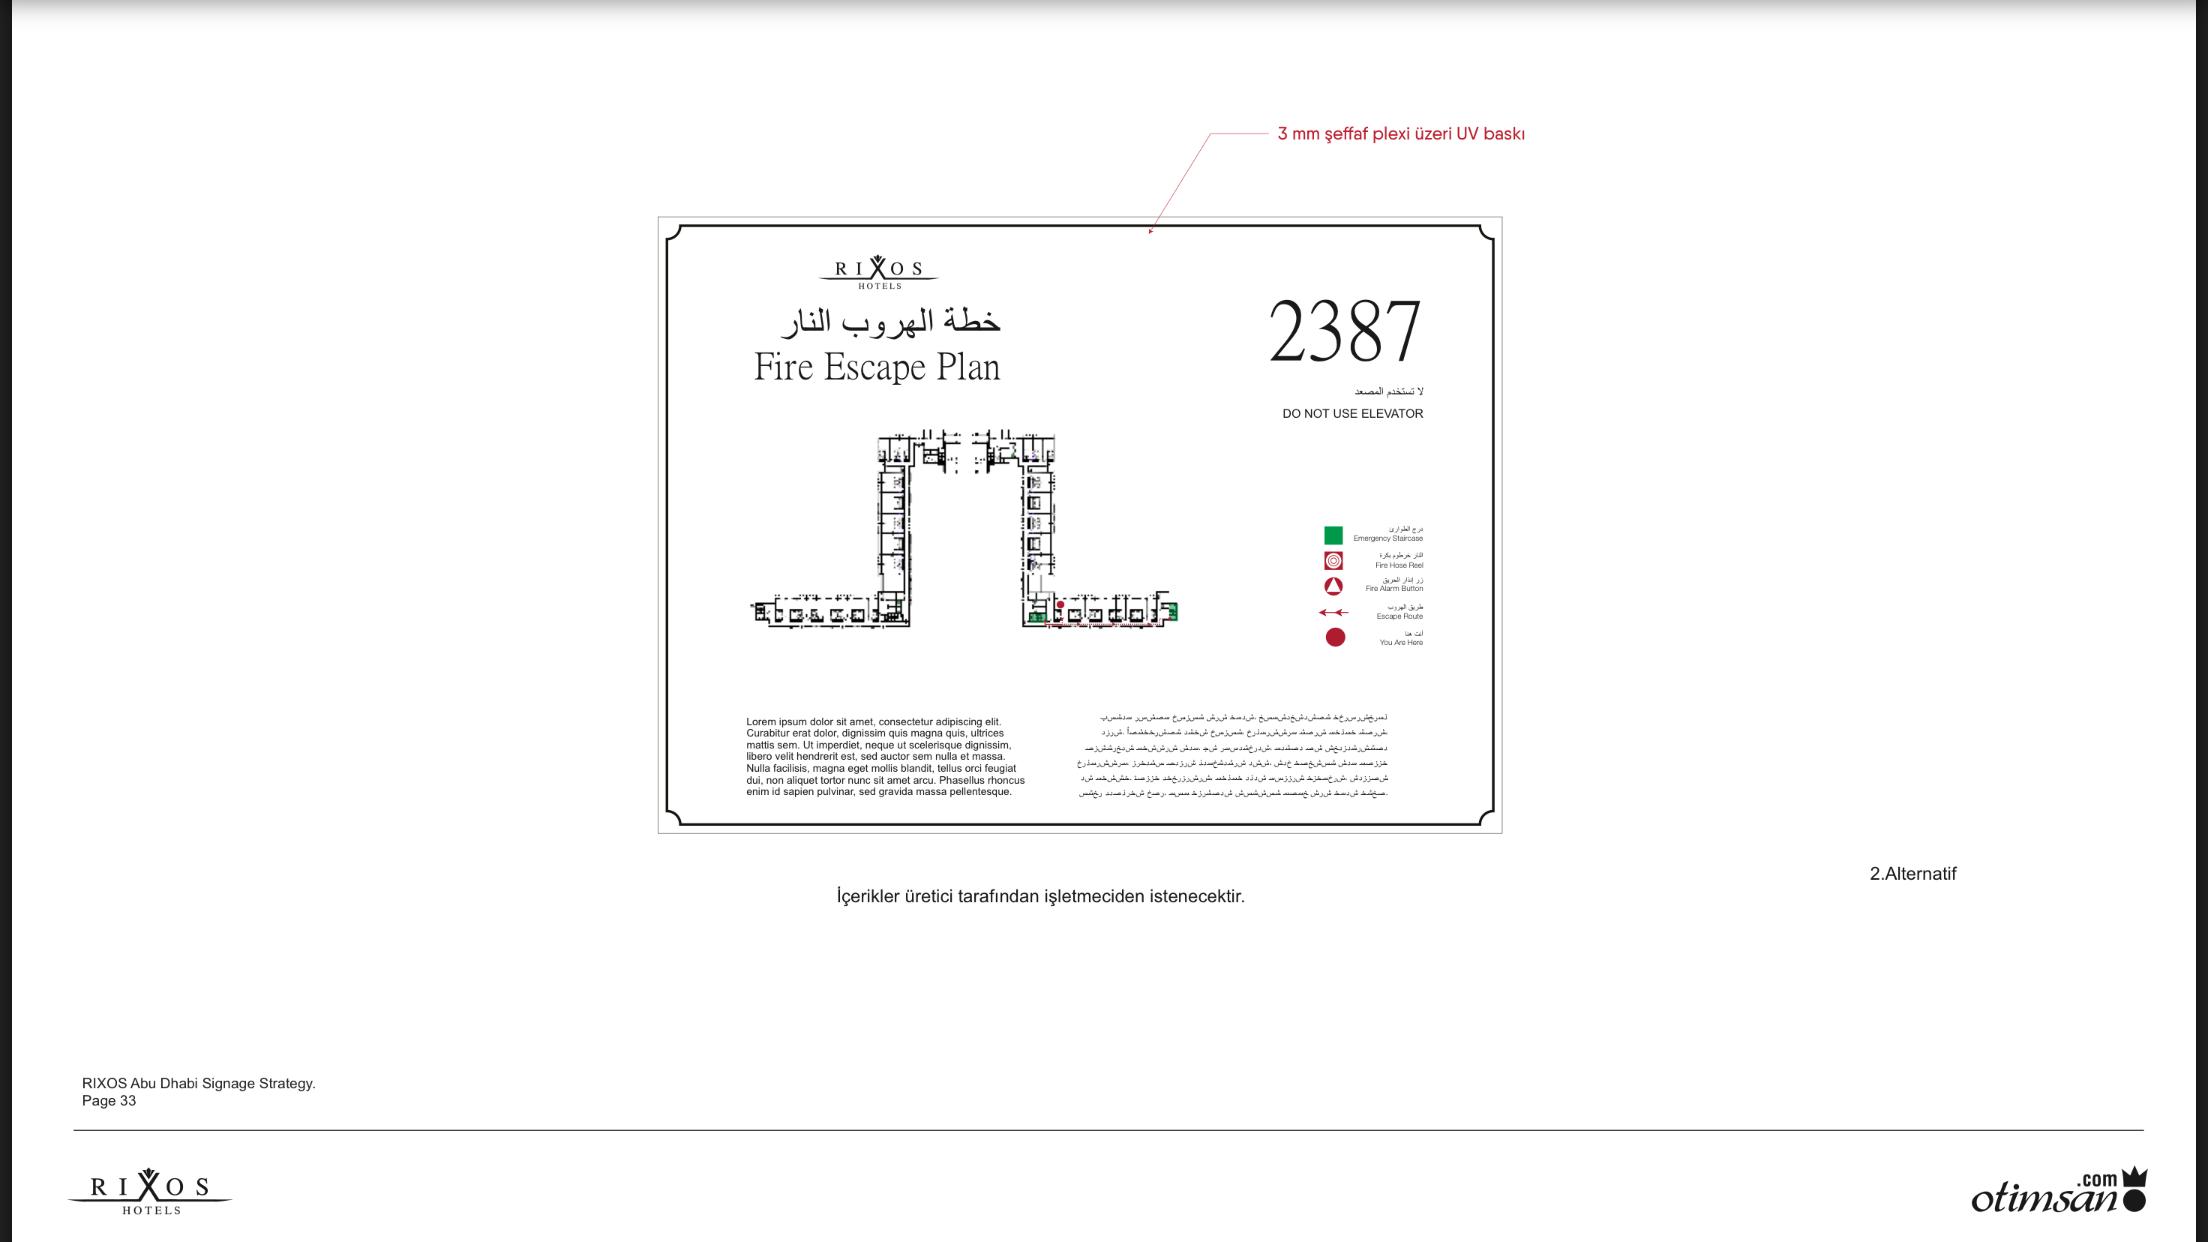 07DF1AC0-B9D7-4823-9F95-FF0A7ACCBC83